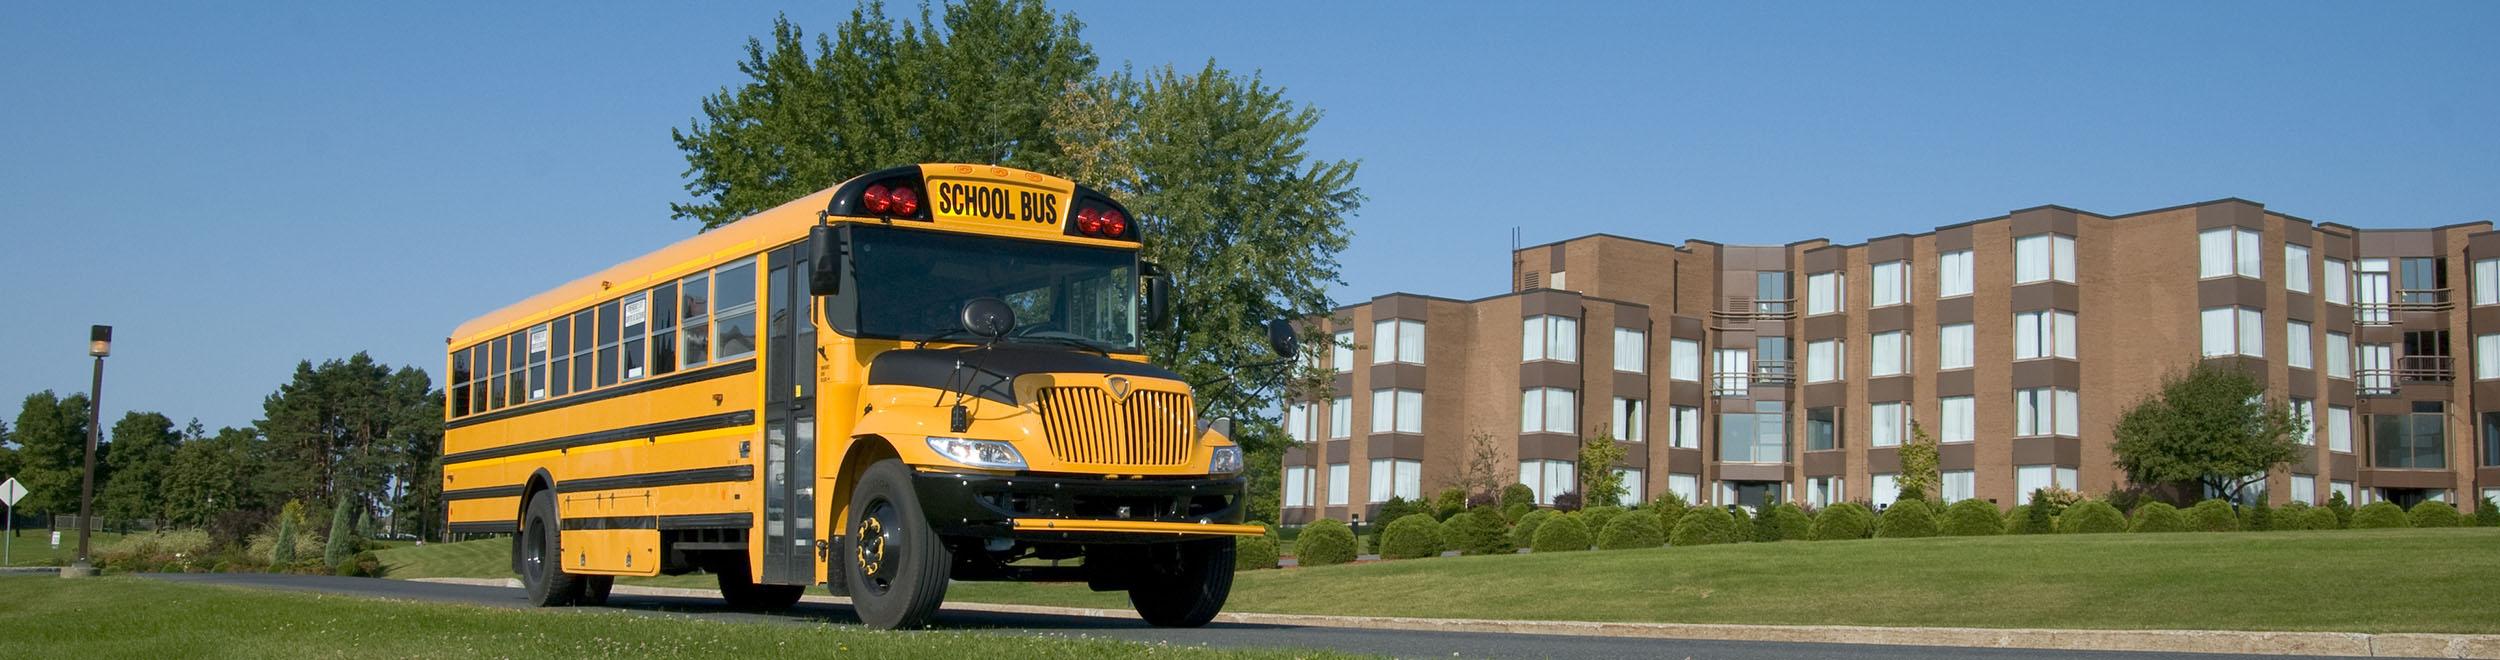 Bus Route Fleet Optimization